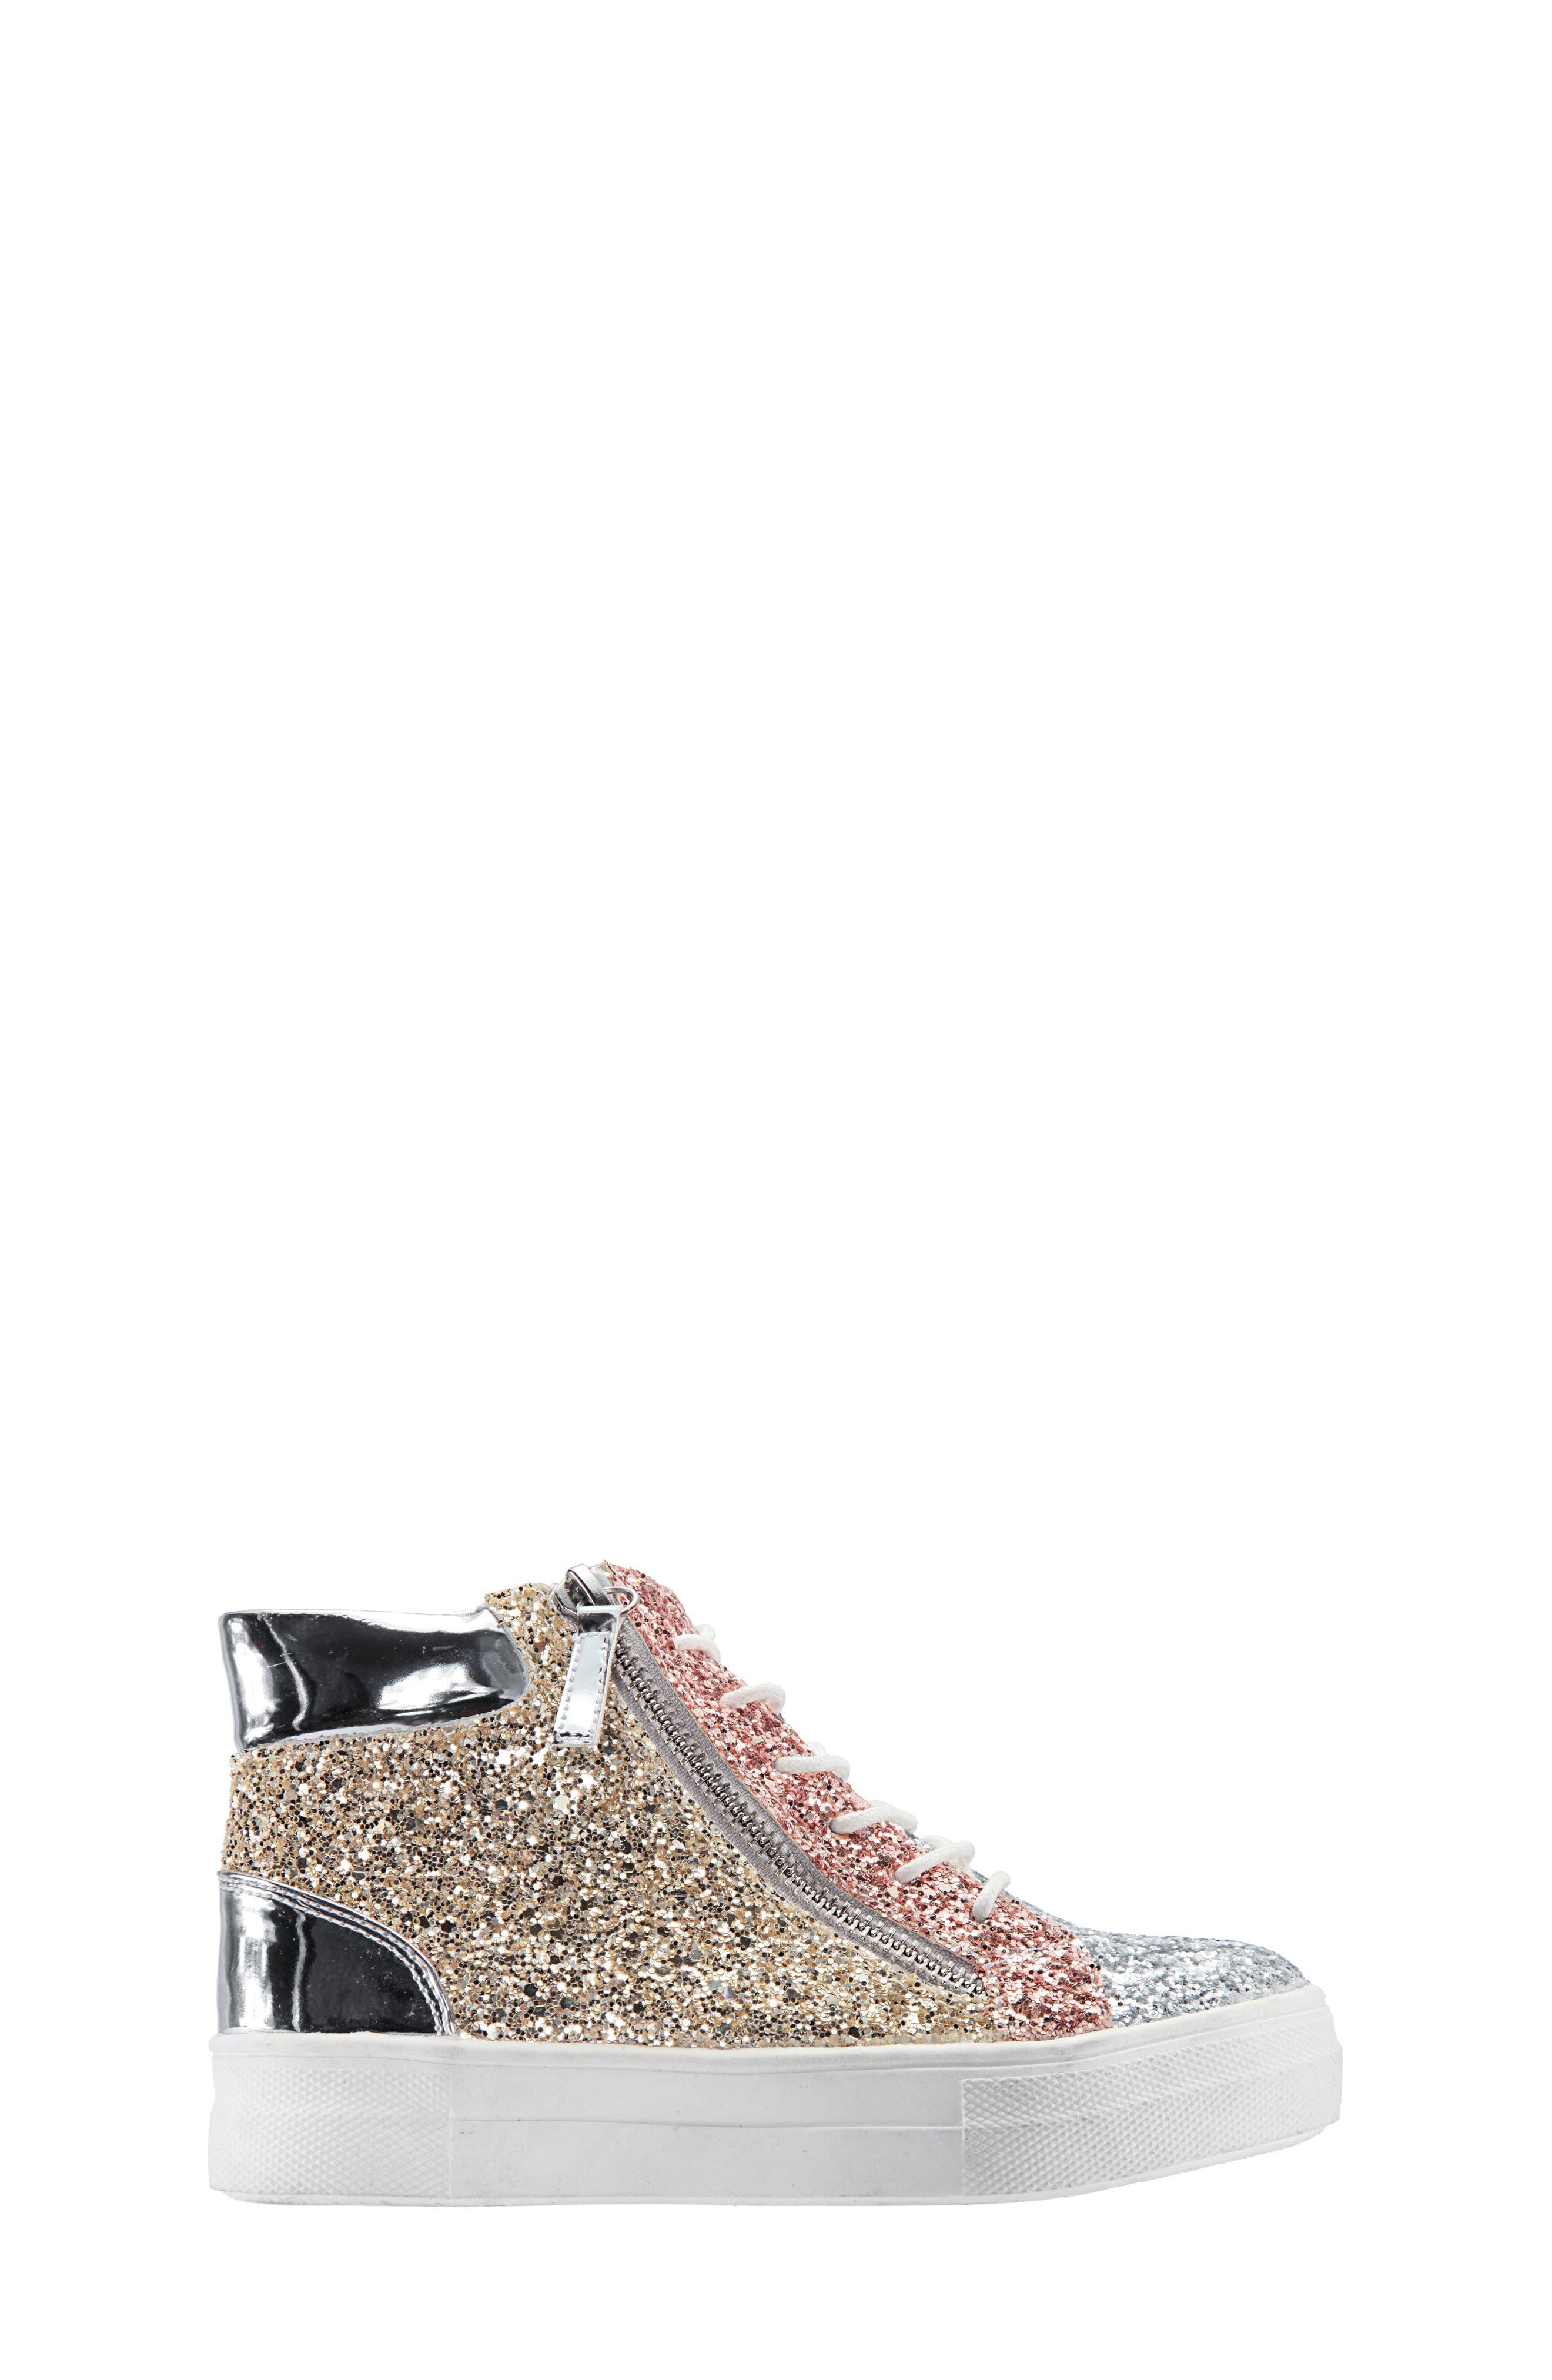 Hylda Glitter High Top Sneaker,                             Alternate thumbnail 3, color,                             SILVER MULTI GLITTER/ PATENT